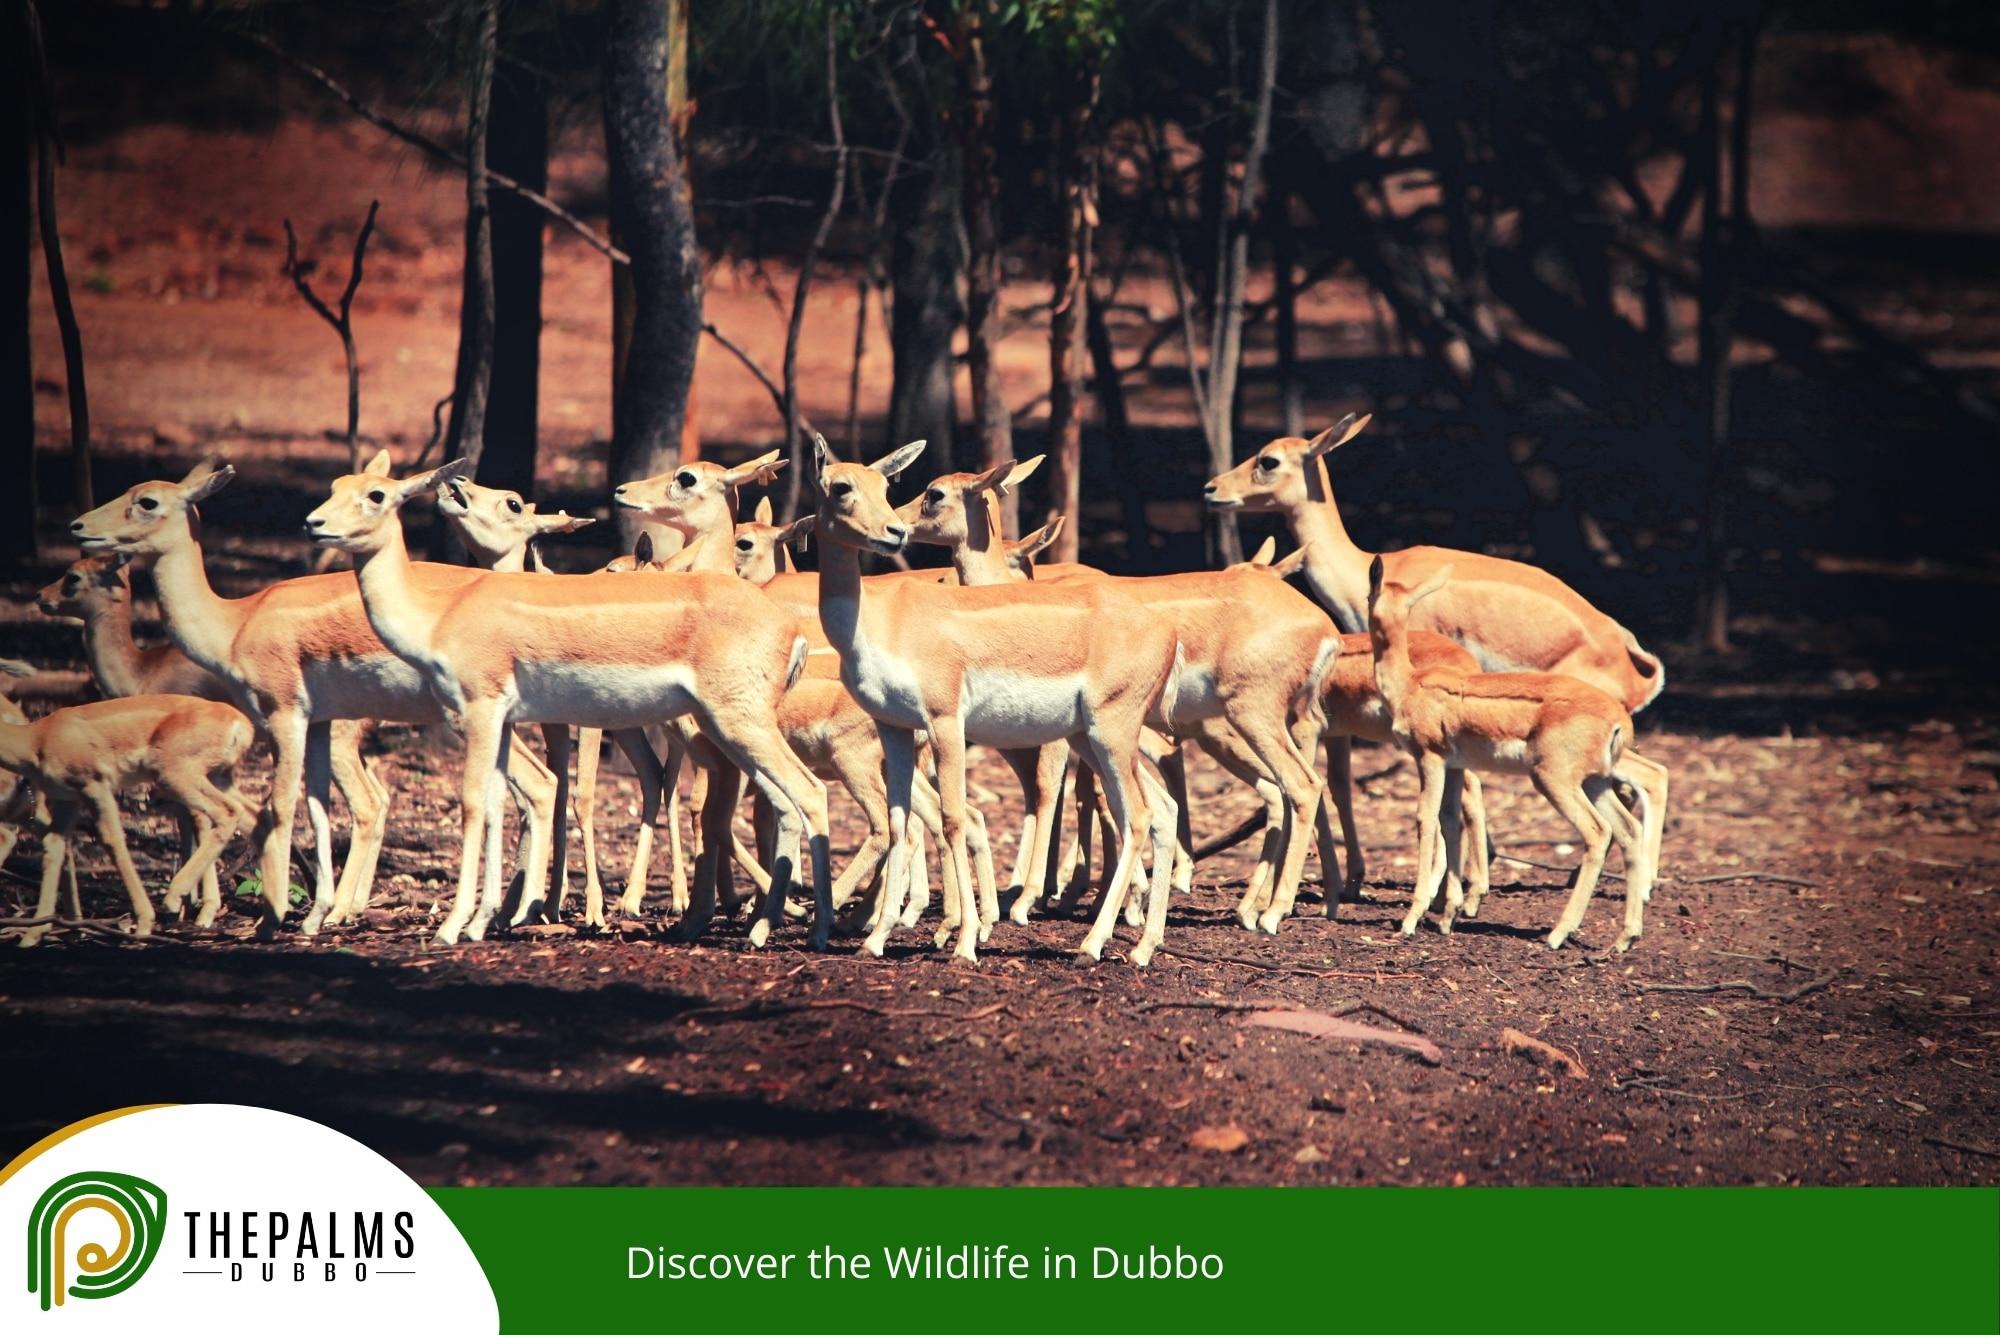 Discover the Wildlife in Dubbo